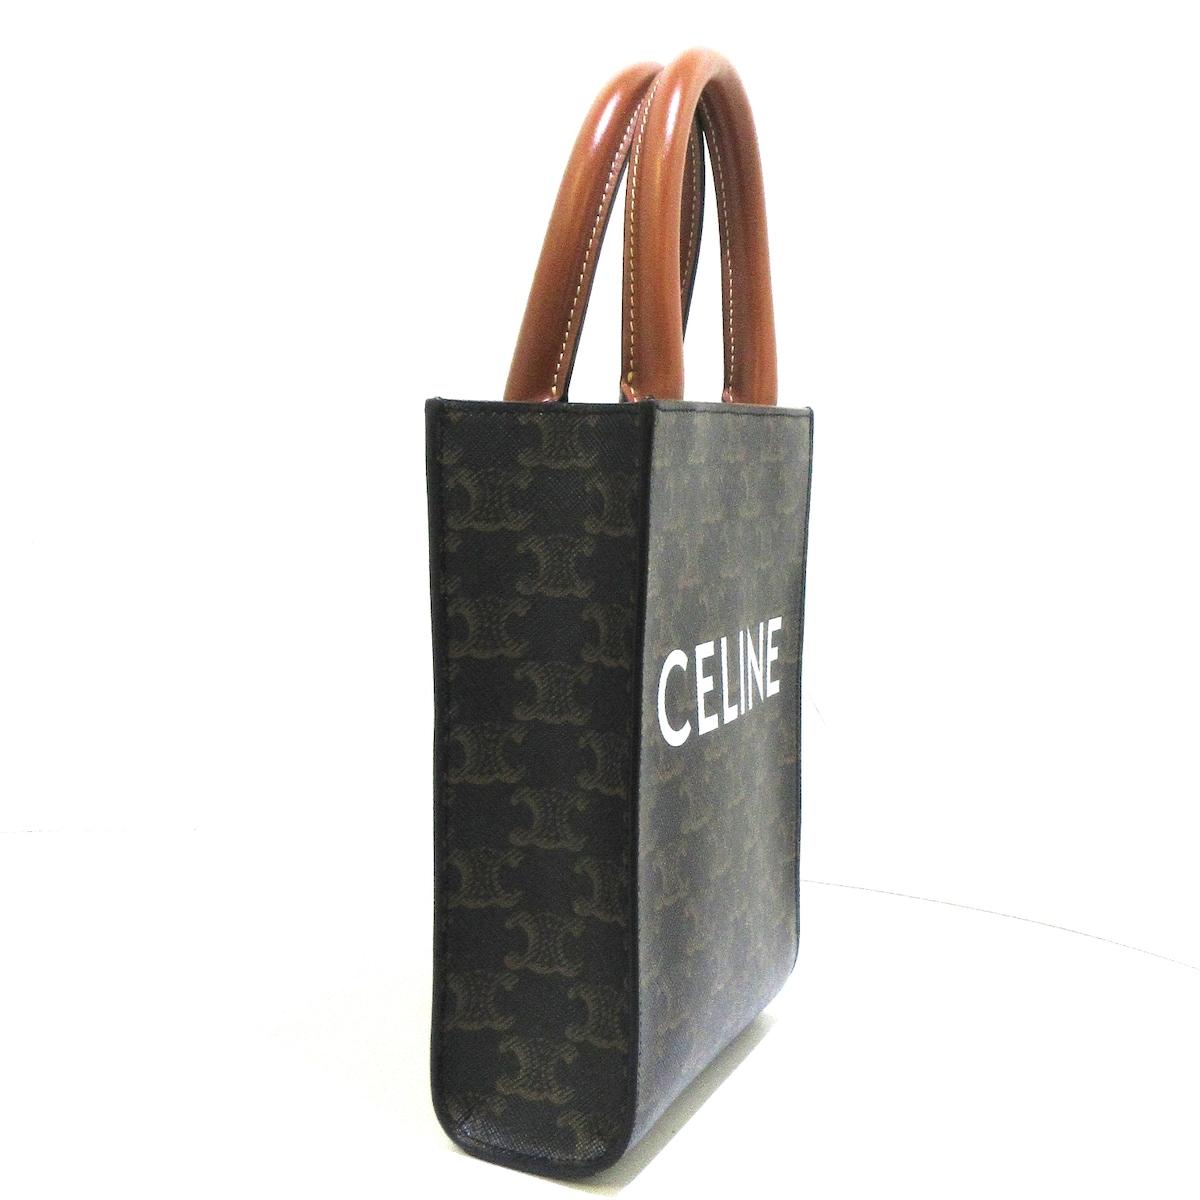 CELINE(セリーヌ)のミニ バーティカルカバ / トリオンフ